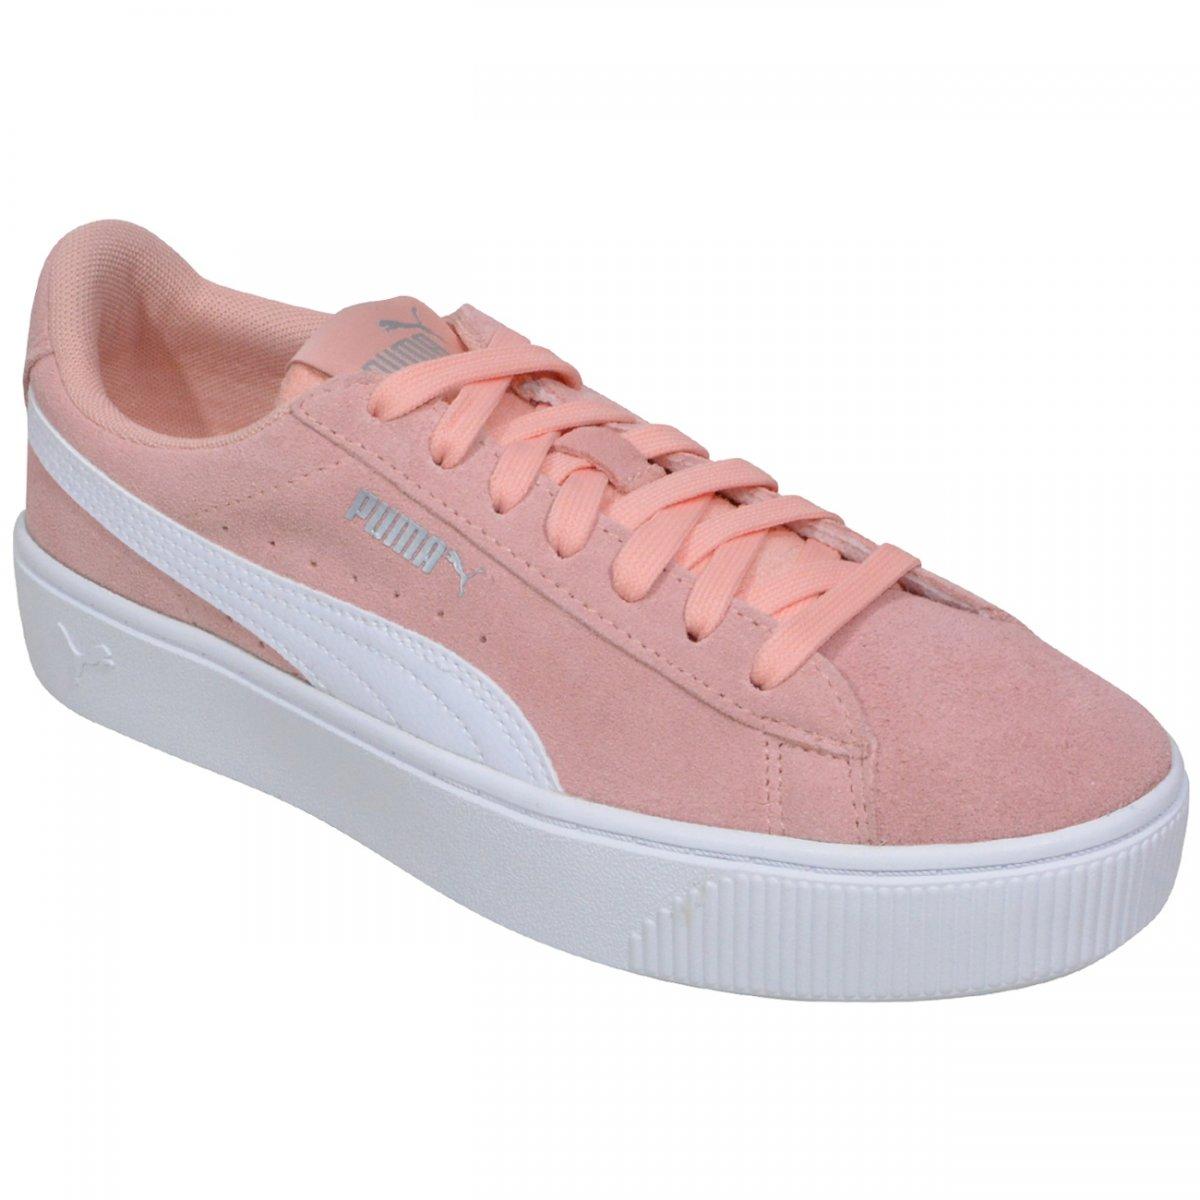 f2487d83dcc Tenis Puma Vikky Stacked SD 369144 07 - Rosa branco - Chuteira Nike ...